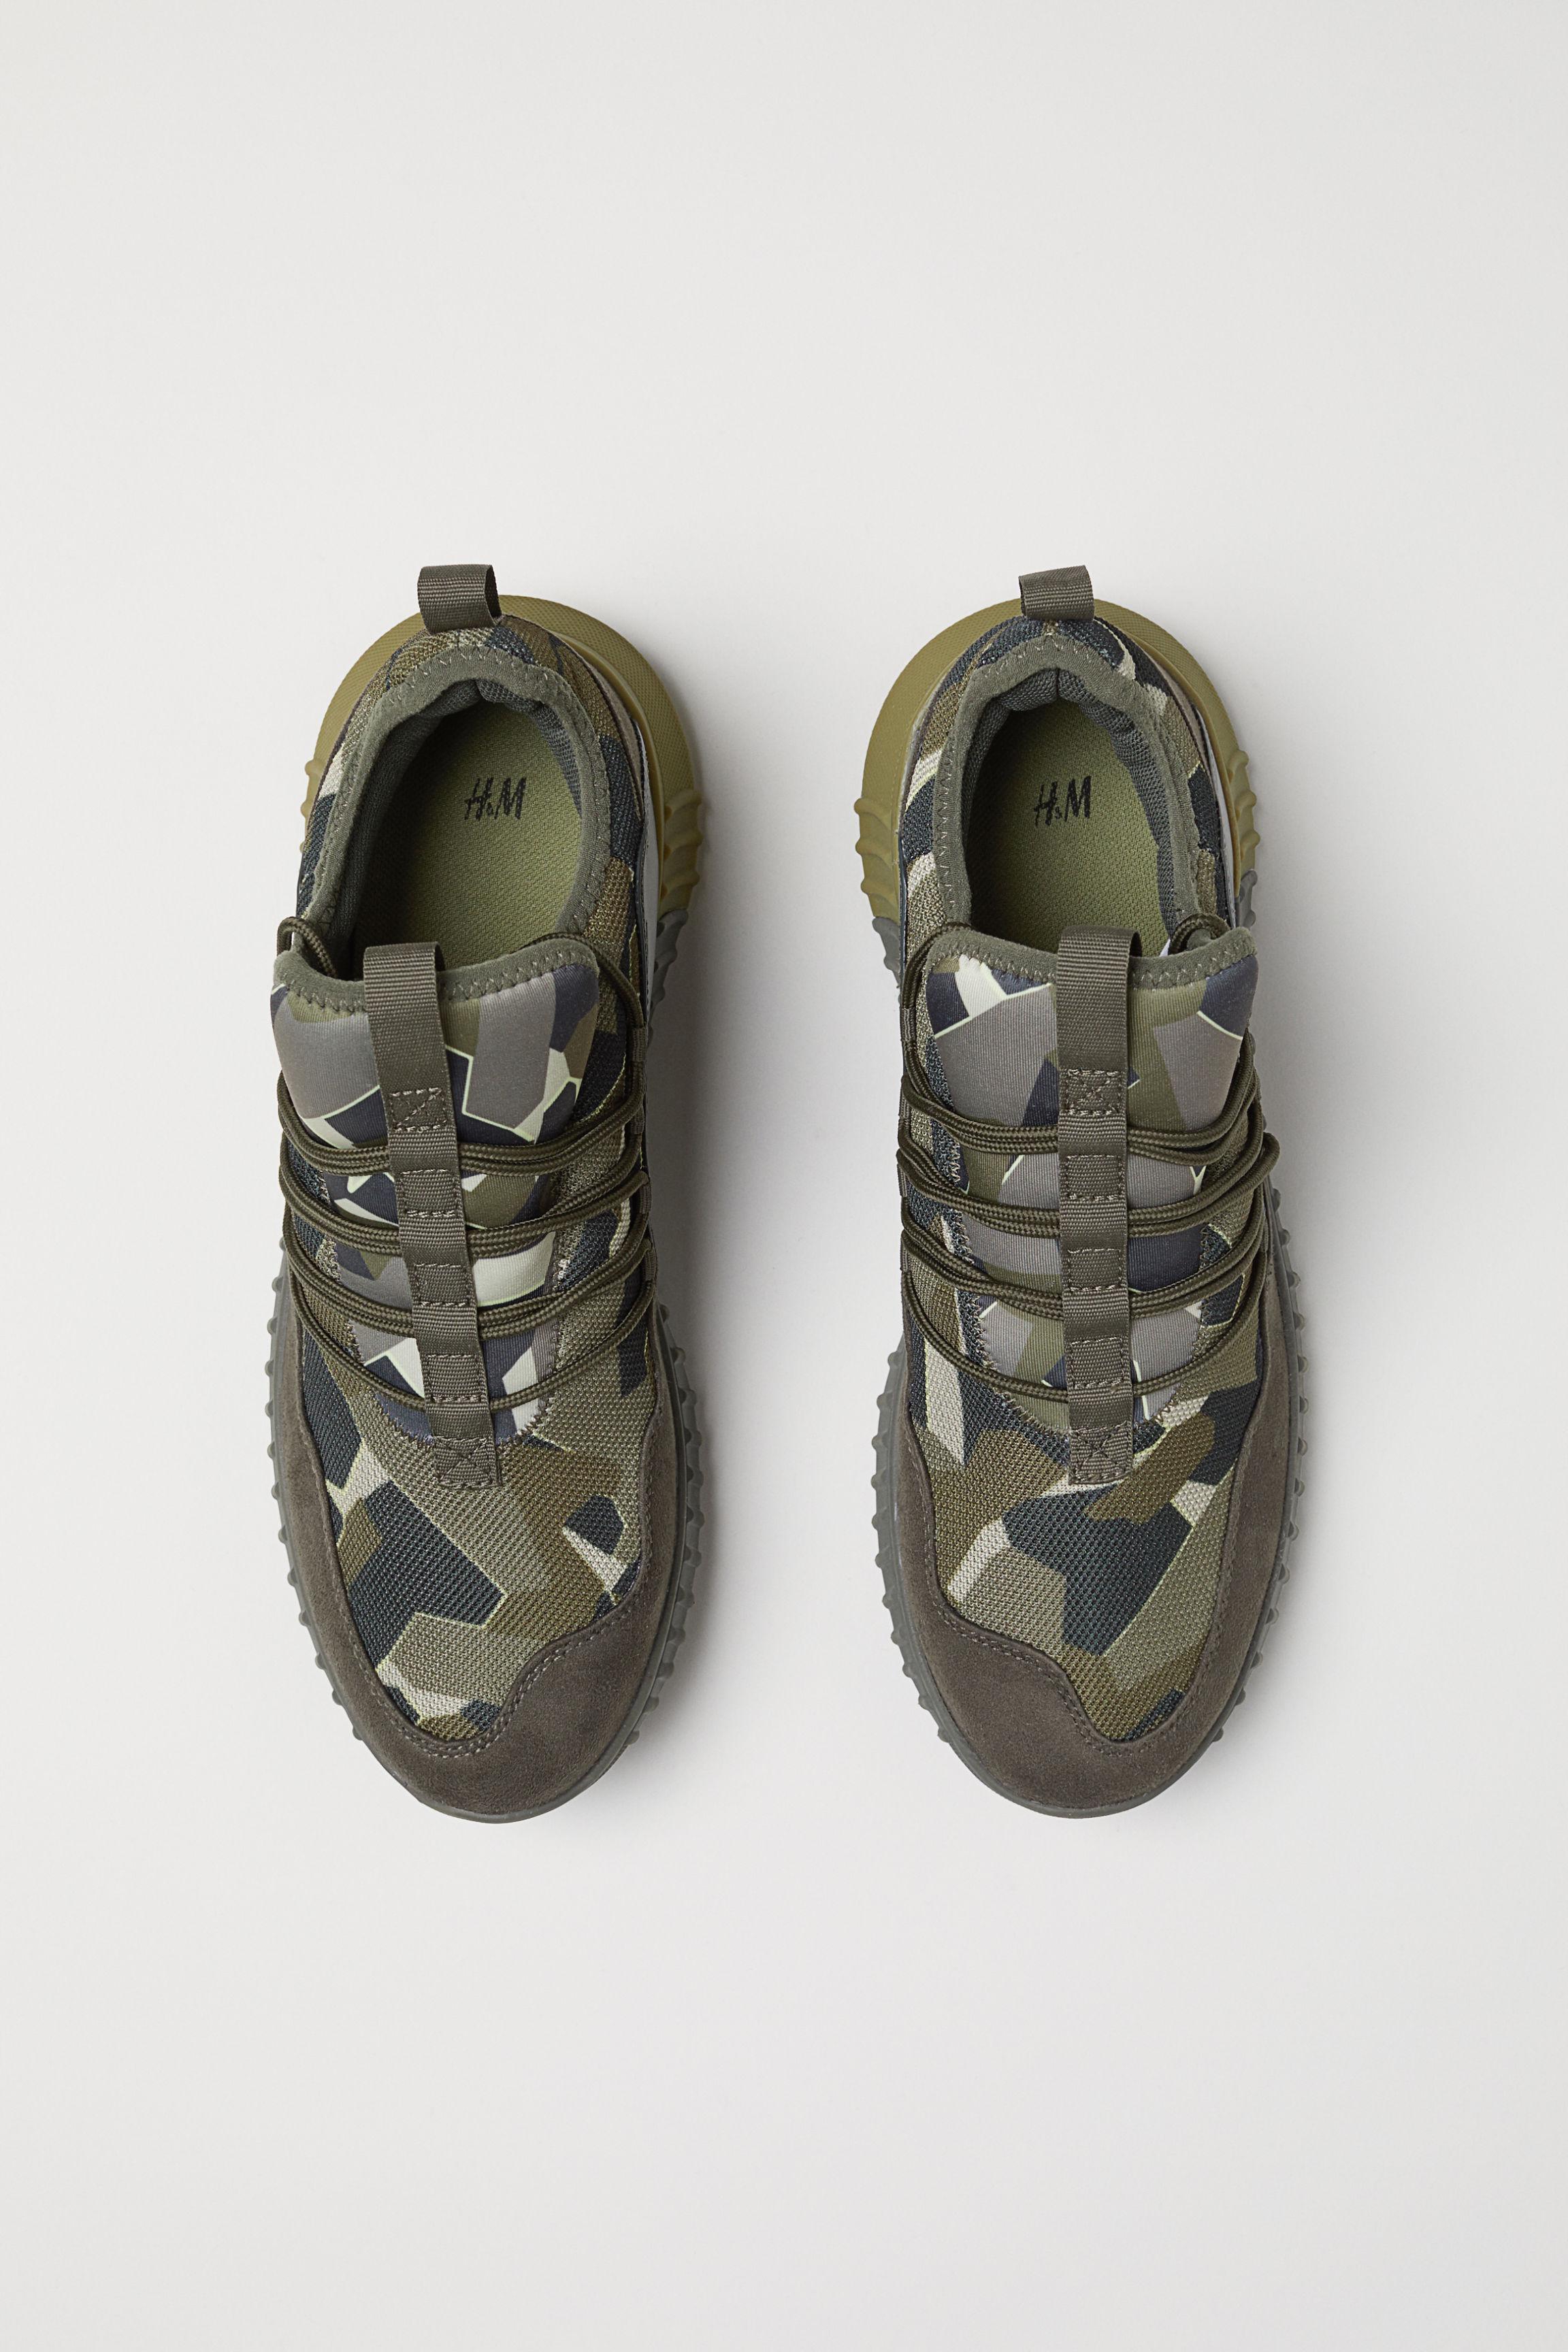 H&M Rubber Mesh Sneakers in Dark Khaki Green/Patterned (Green) for Men